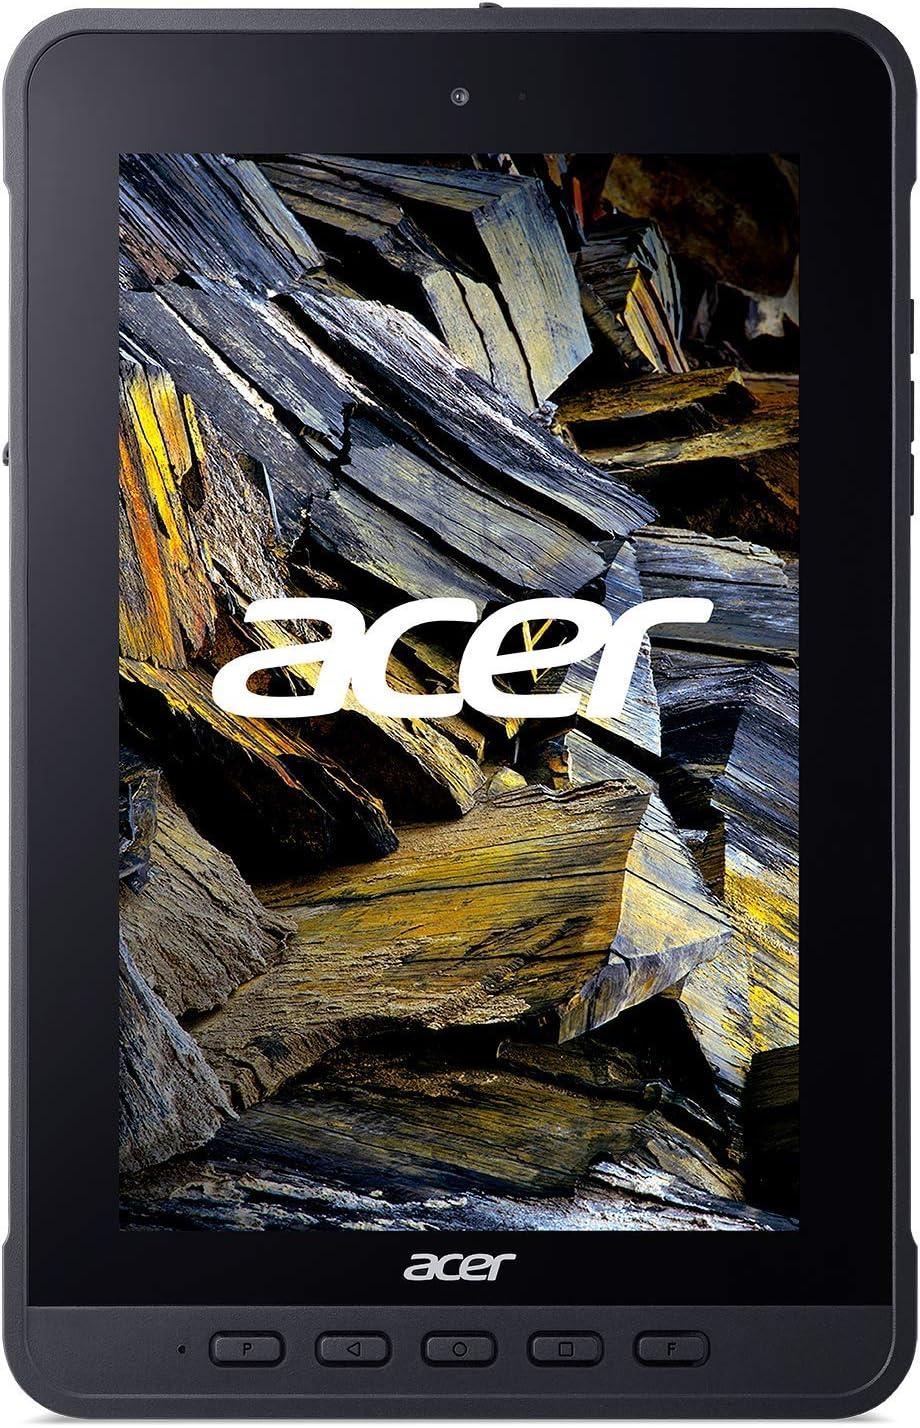 "Acer Enduro T1 ET108-11A-80PZ Rugged Tablet, 8.0"" WXGA IPS Touch, MediaTek MT8385 Octa-Core Processor, 4GB LPDDR4, 64GB eMMC, WiFi-5, Front 2MP Webcam, Rear 5MP Webcam, Handstrap, Android 9 Pie"